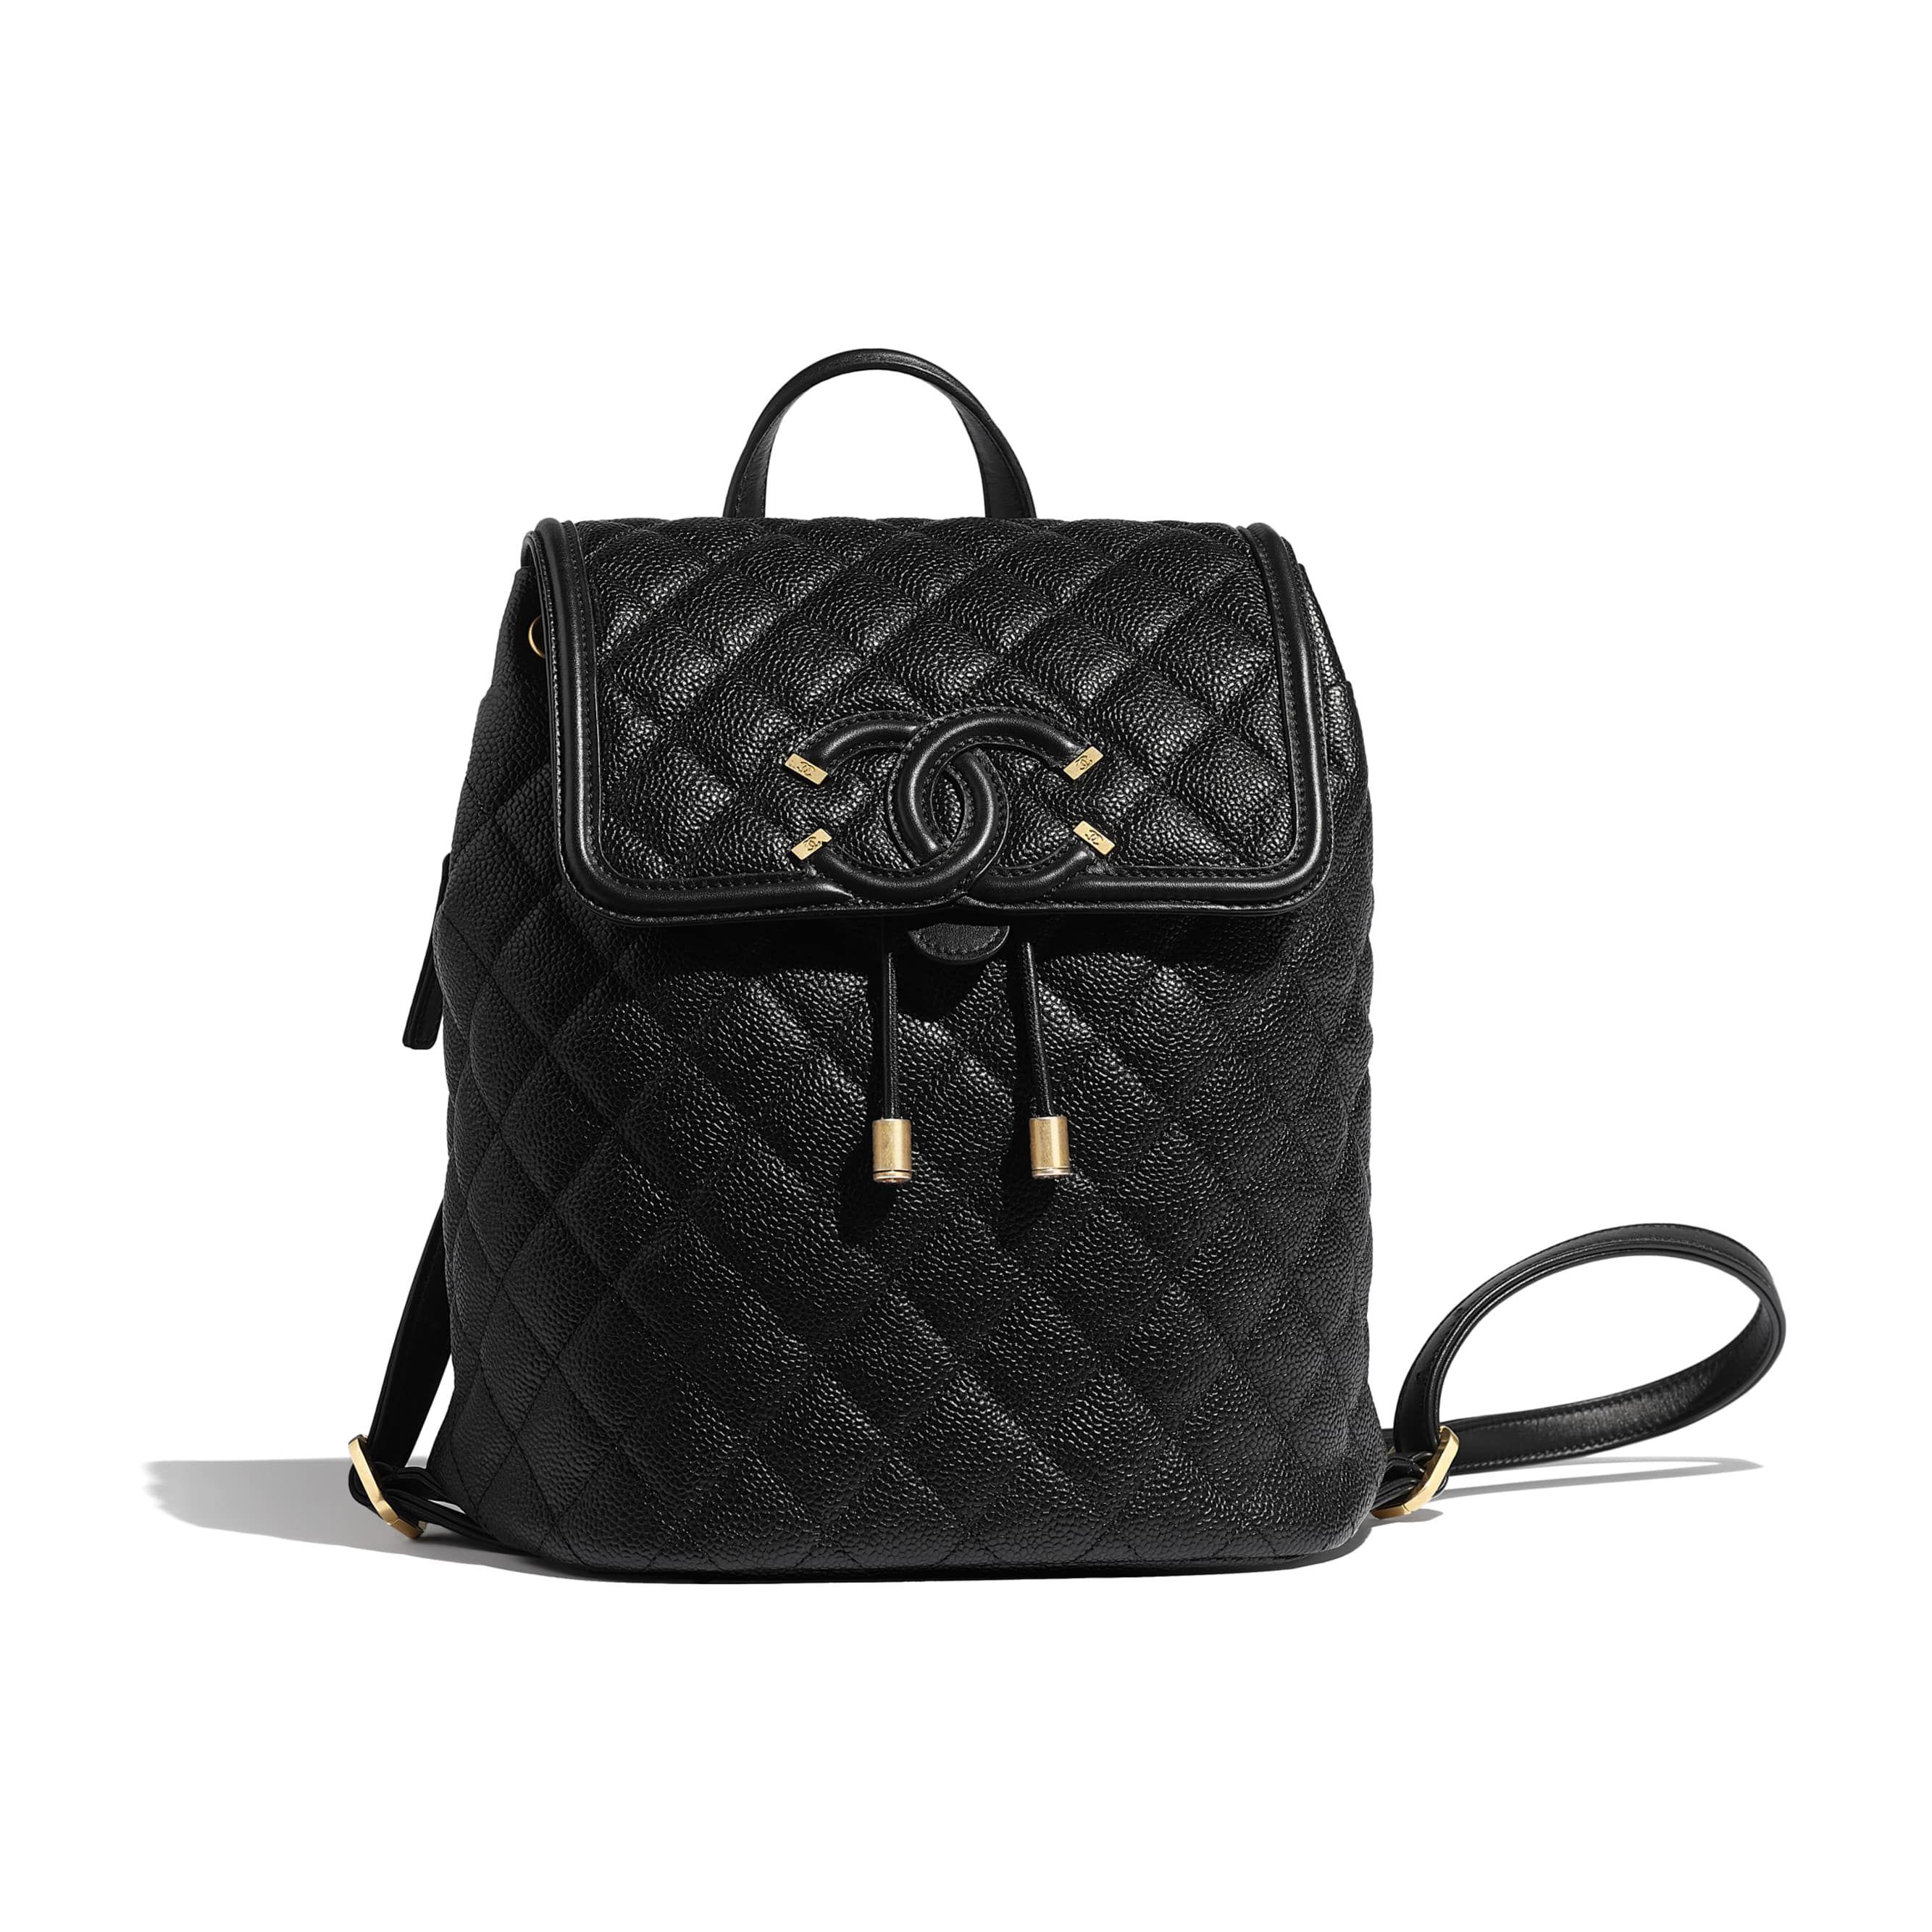 6d16d29d3e Chanel - PRE FW2018 19